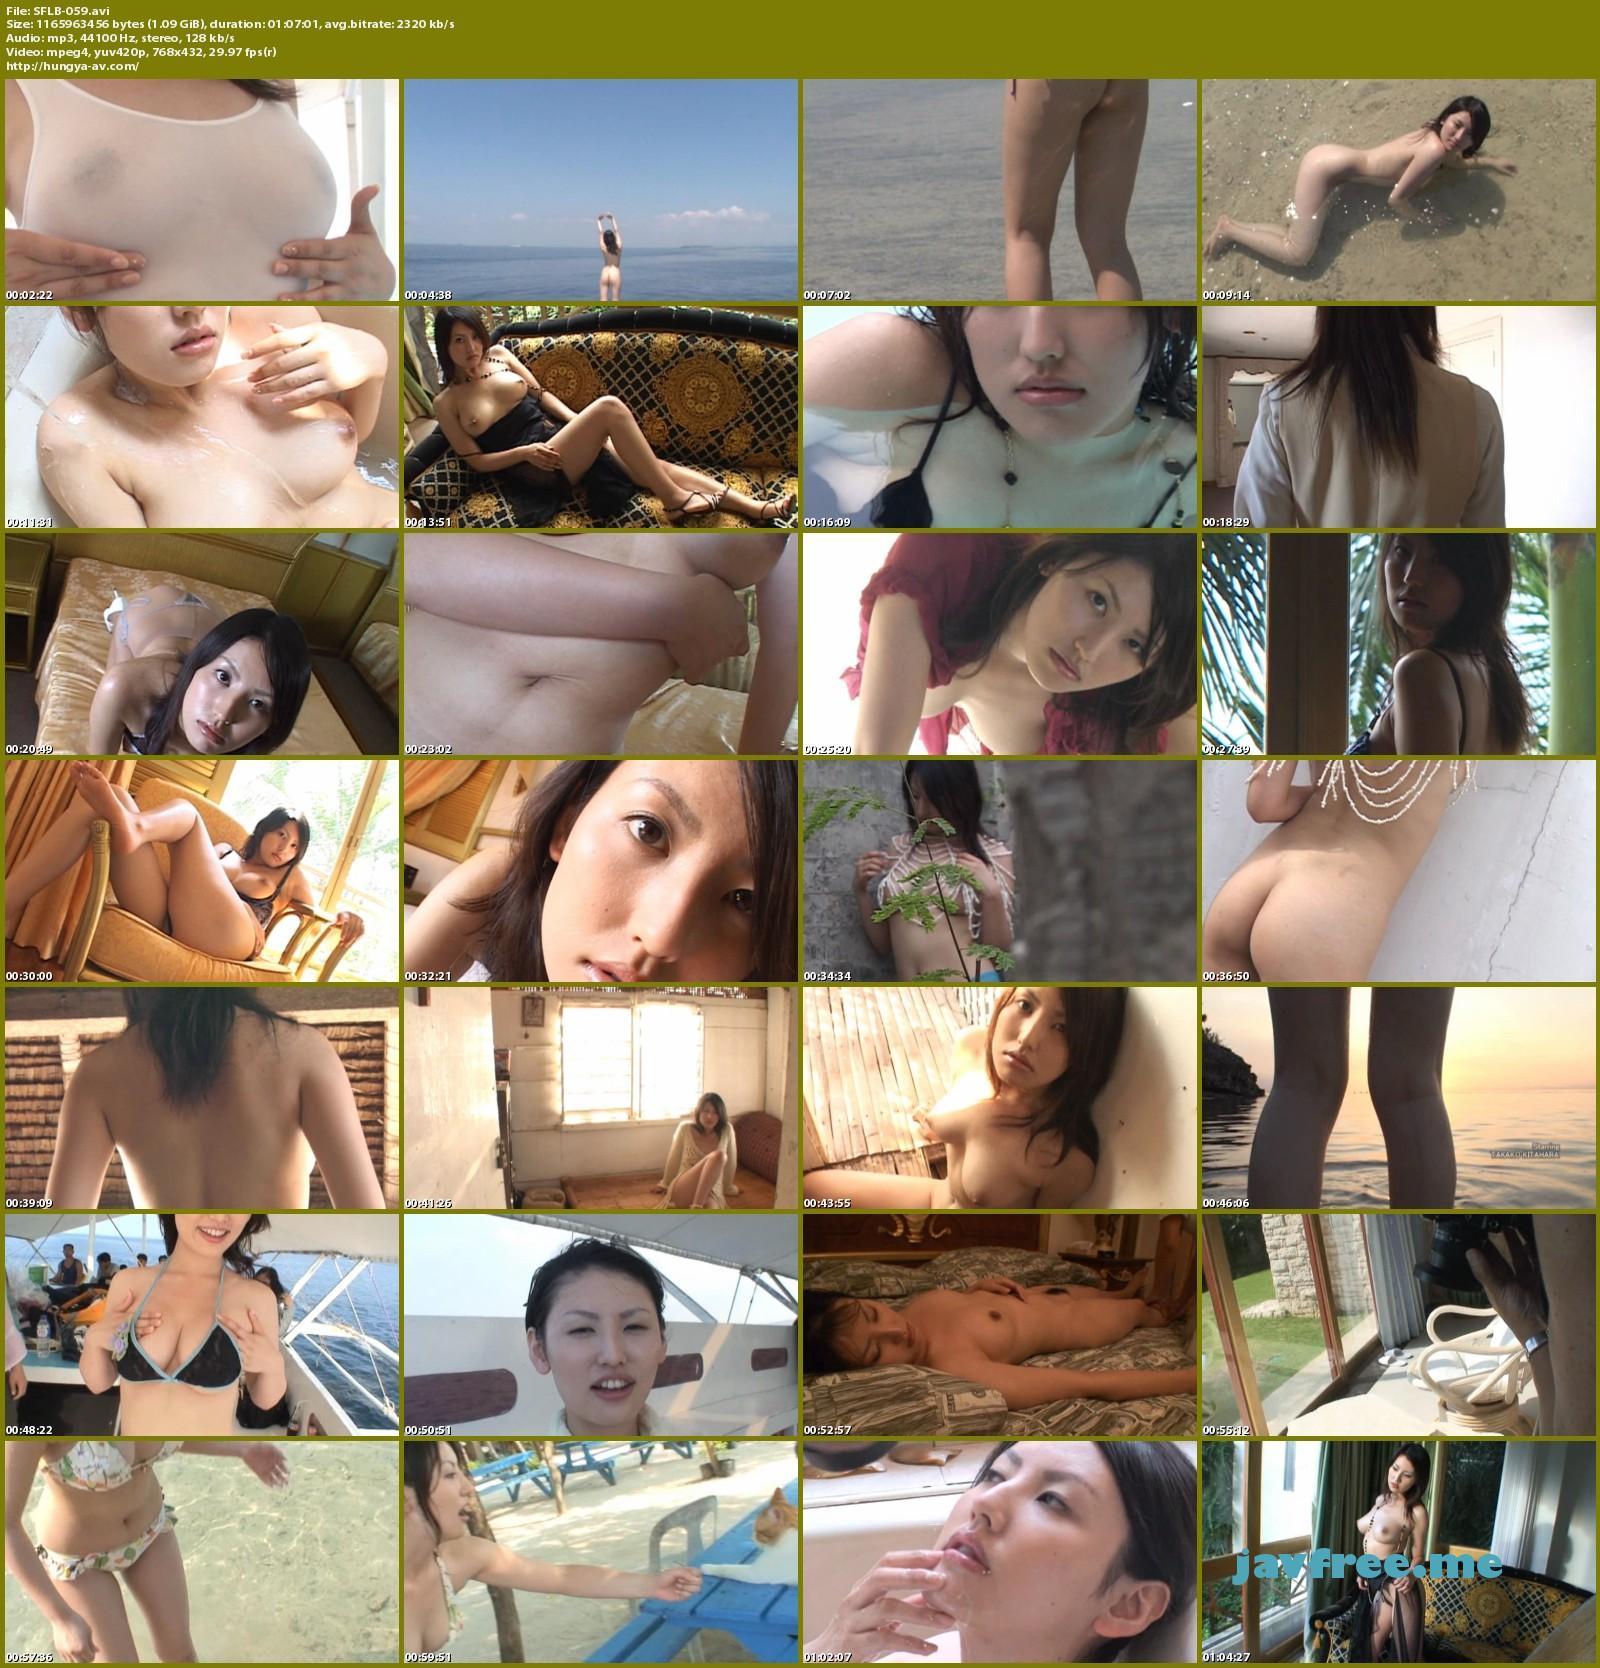 [SFLB 059] 裸体 北原多香子 北原多香子 Shuffle